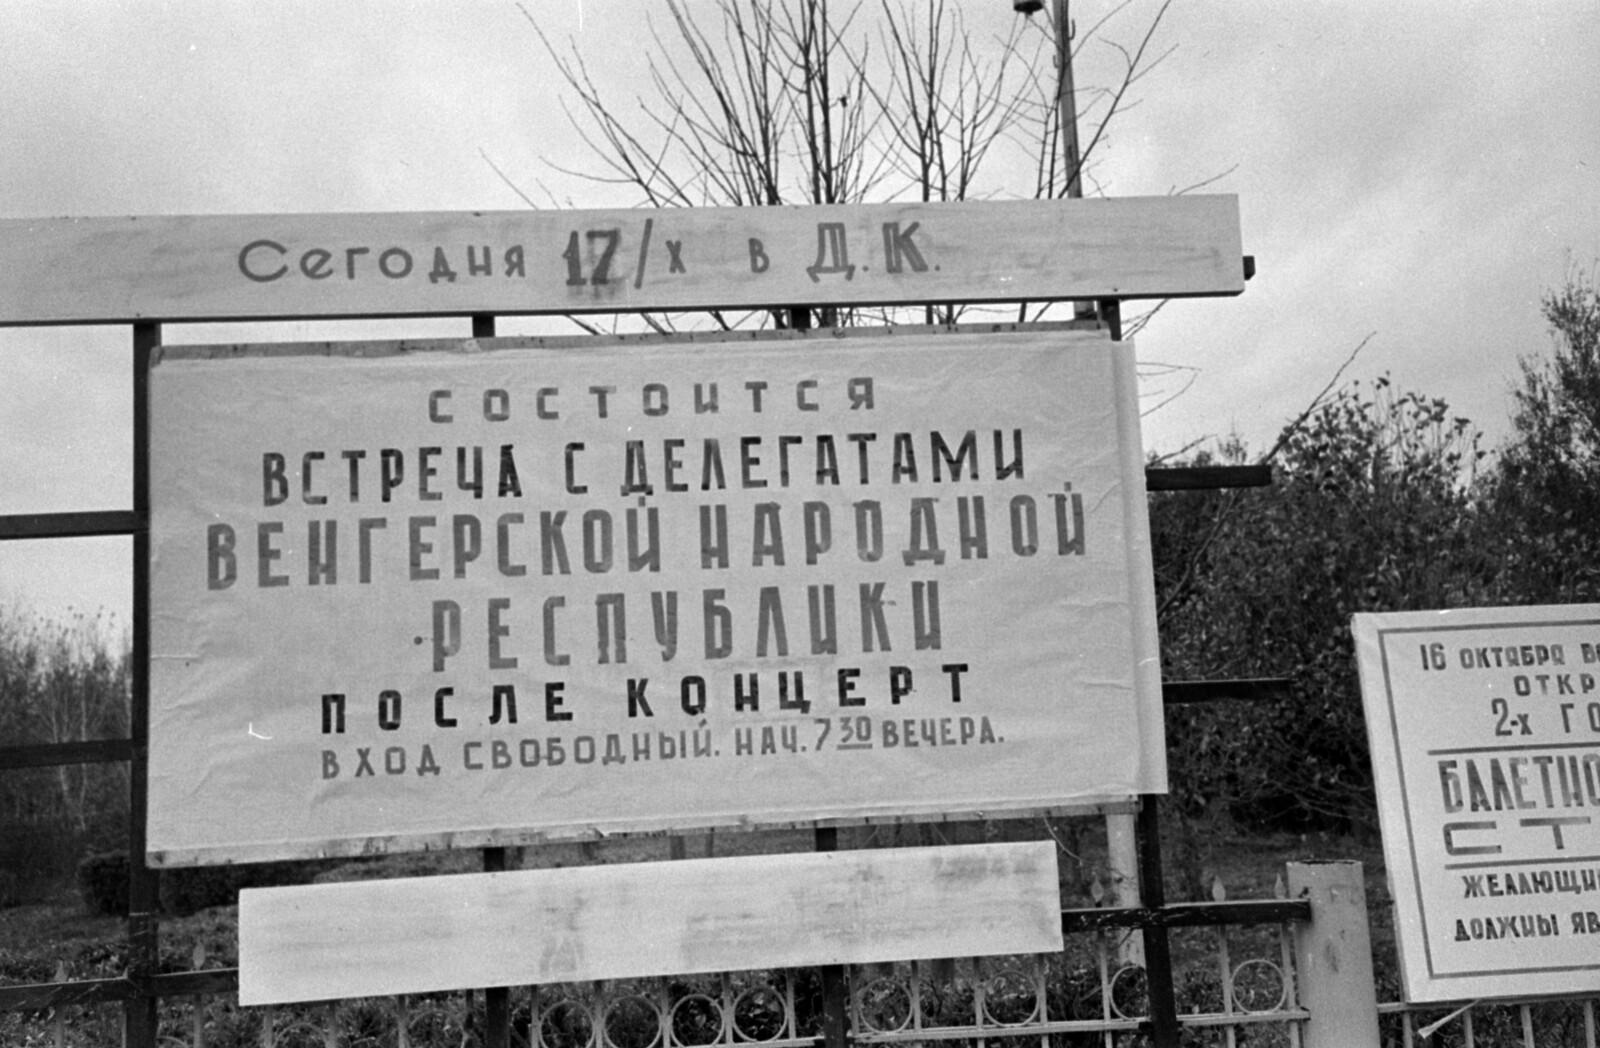 26. Колхоз под названием «XXII съезд КПСС». Дом культуры